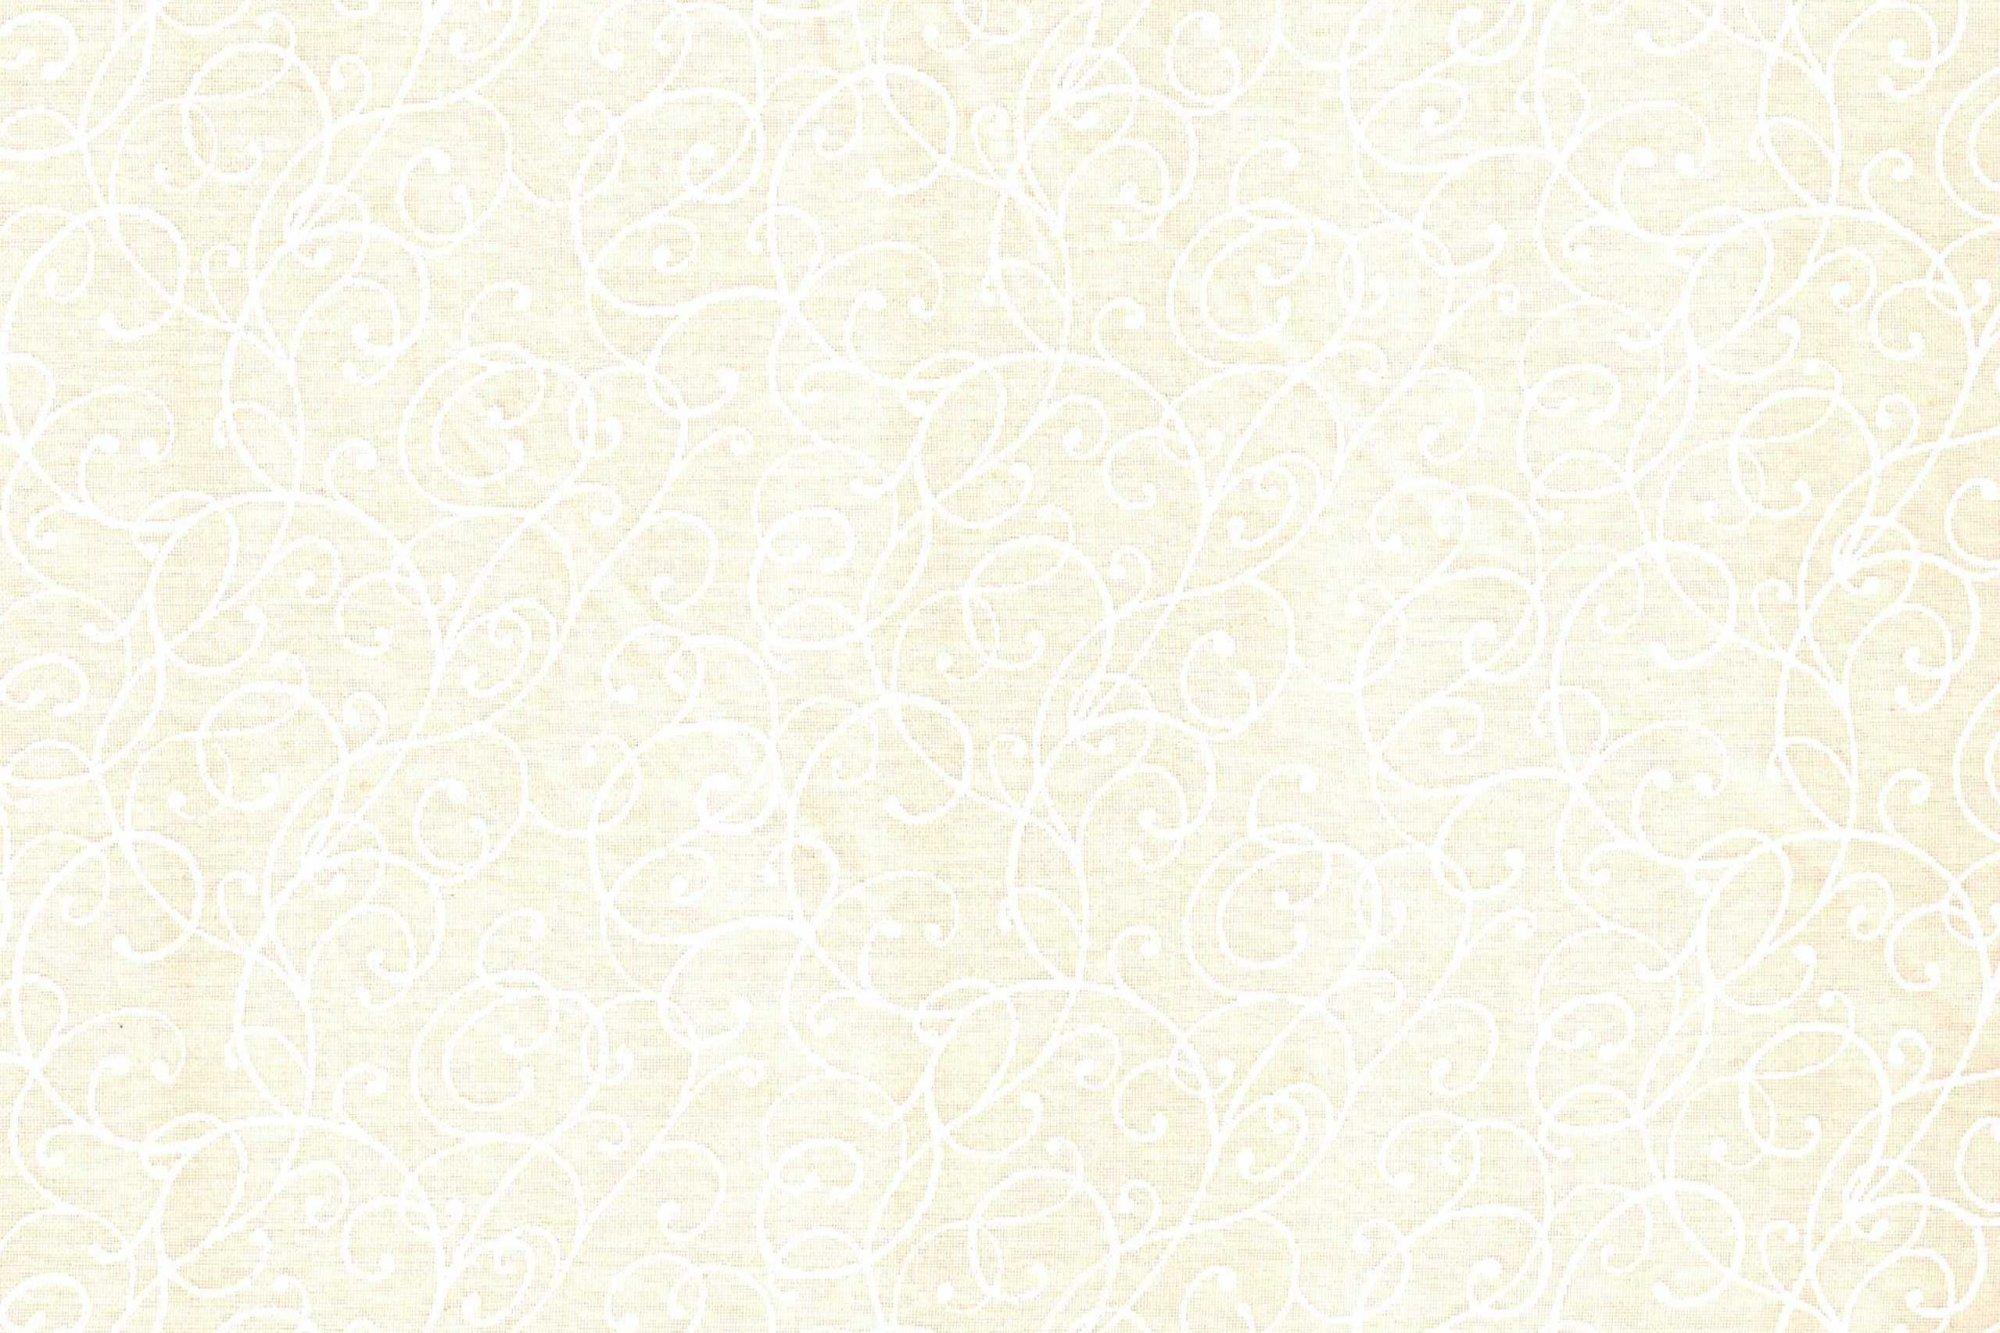 D S-P 47717 WHITE ON WHITE SMALL PRINT